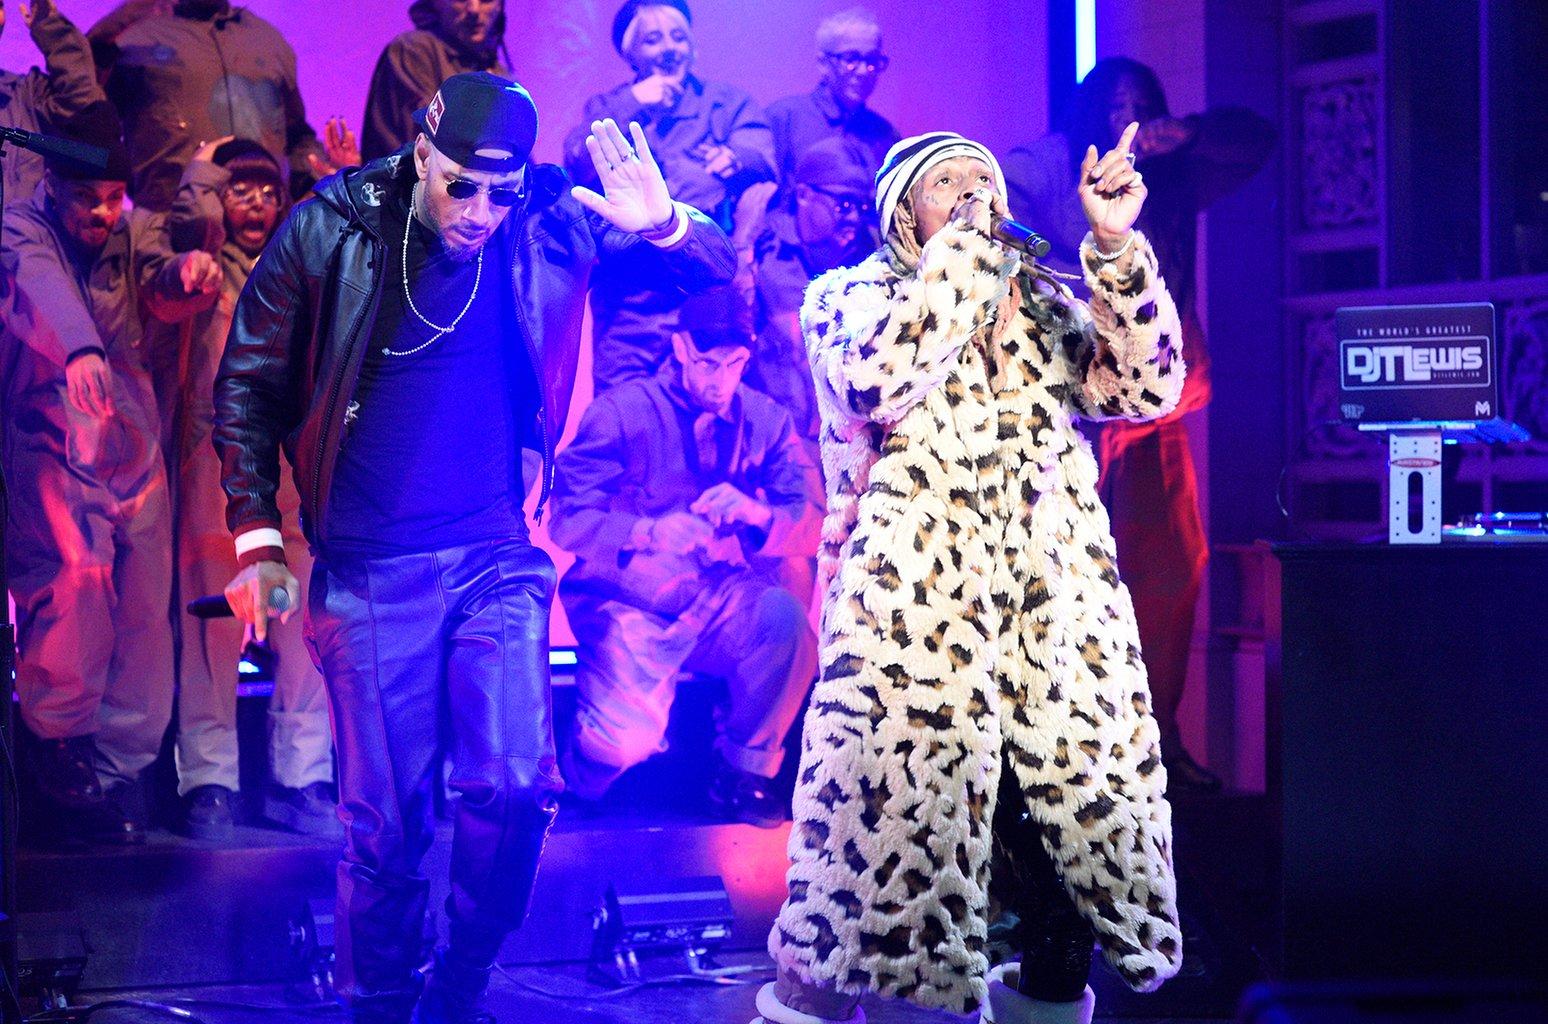 HustleTV.tv- Lil Wayne Swizz Beatz And Halsey Performs Can't Be Broken And Uproar On SNL DJ Hustle